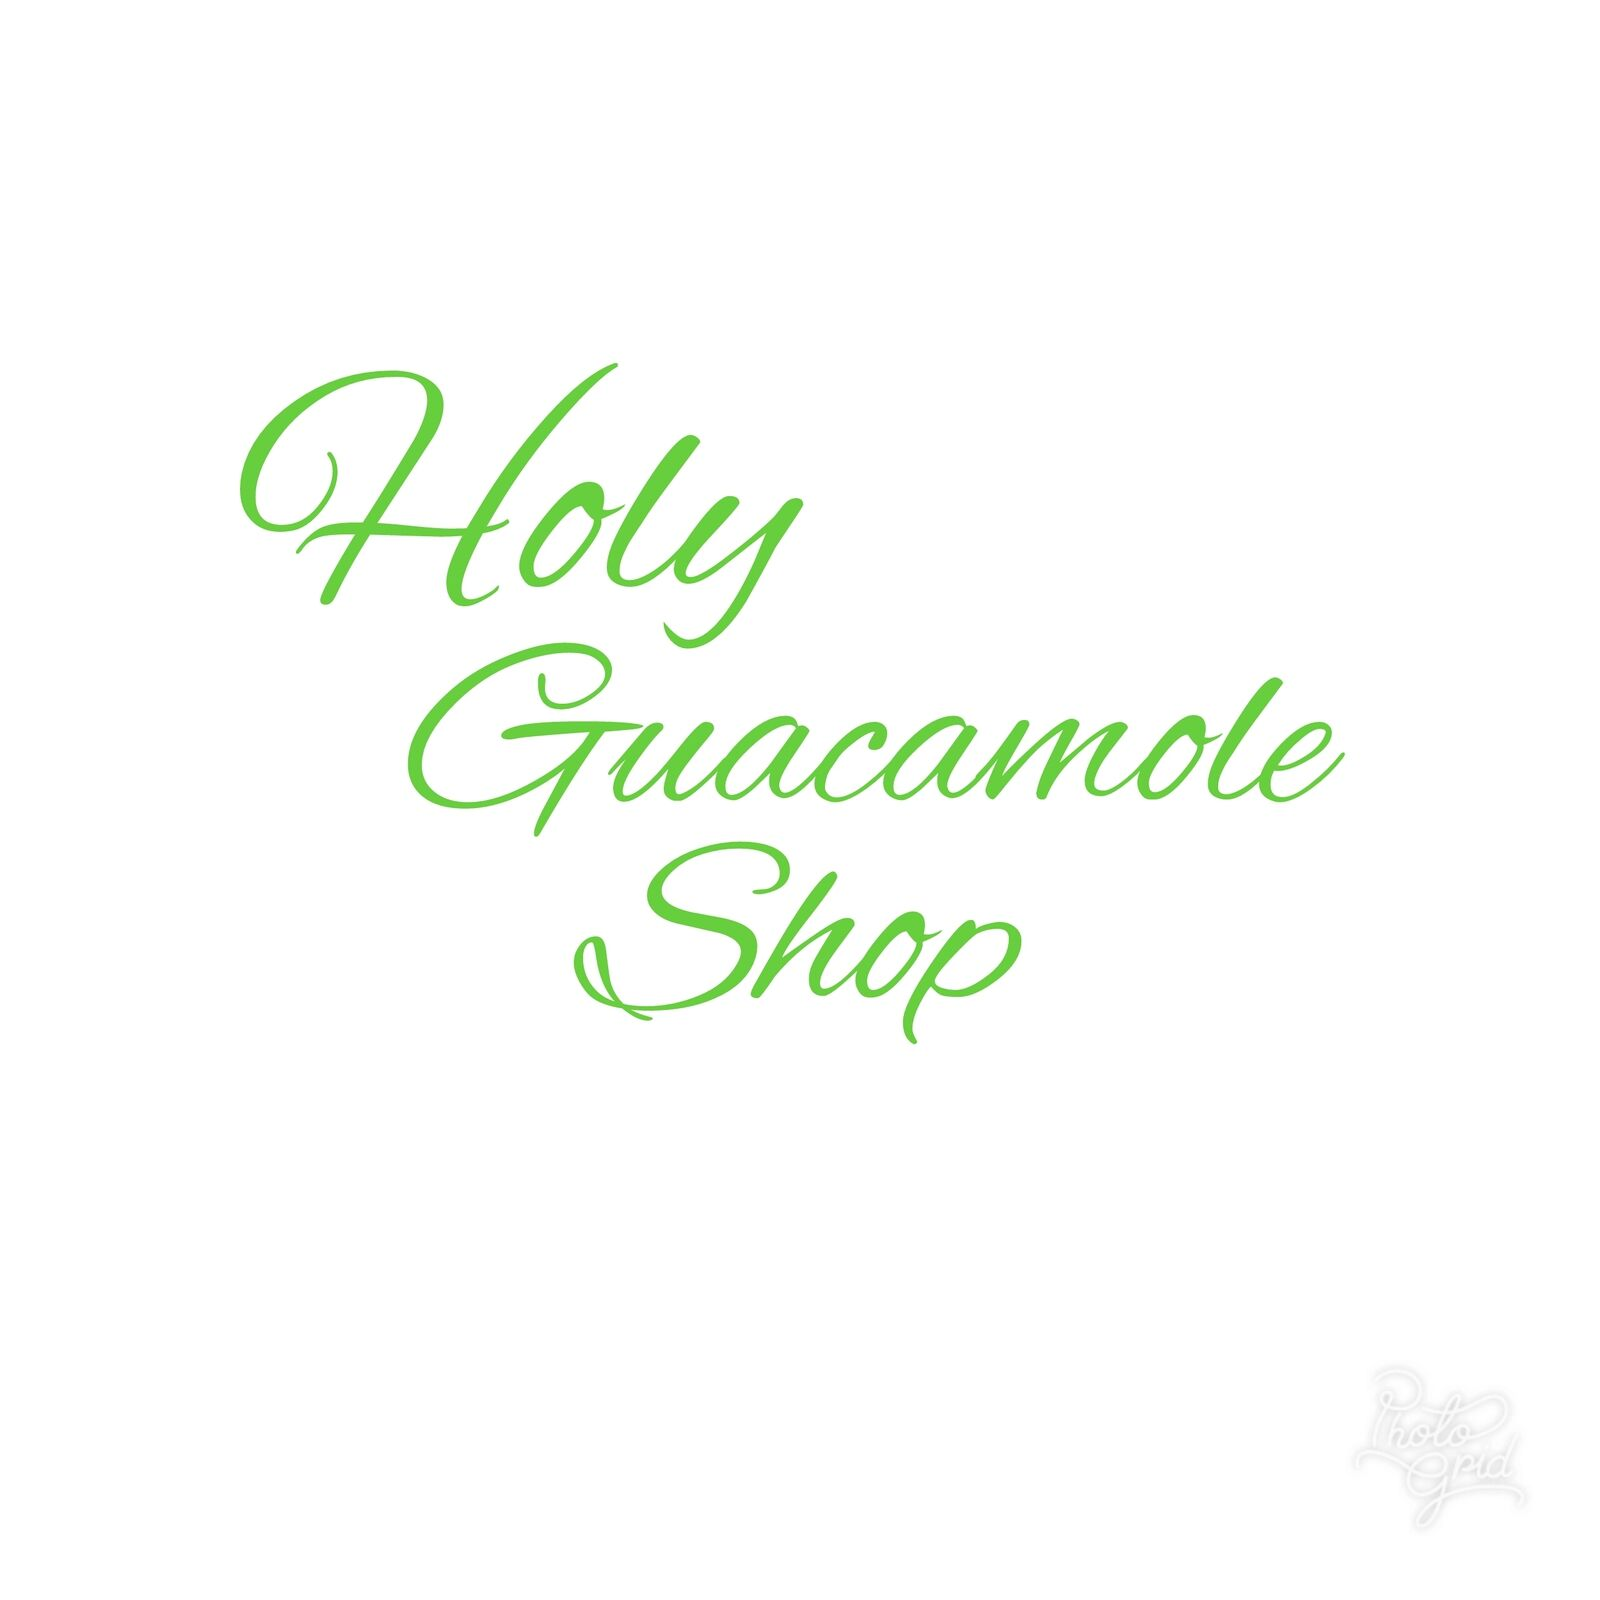 Holy Guacamole Shop